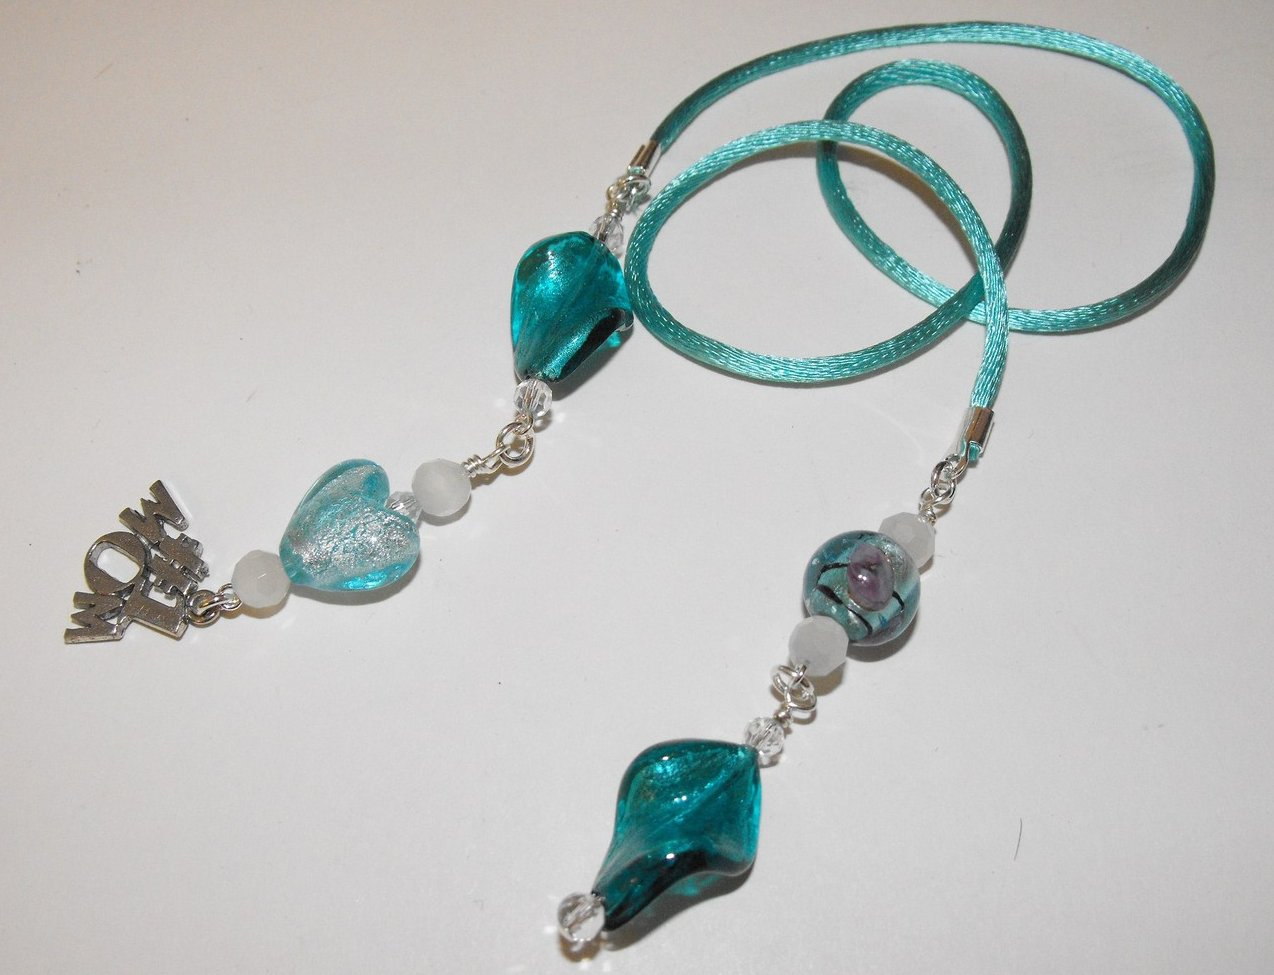 Image 2 of Mom Book Thong Bookmark Aqua Murano Lampwork Beads Silver Plated